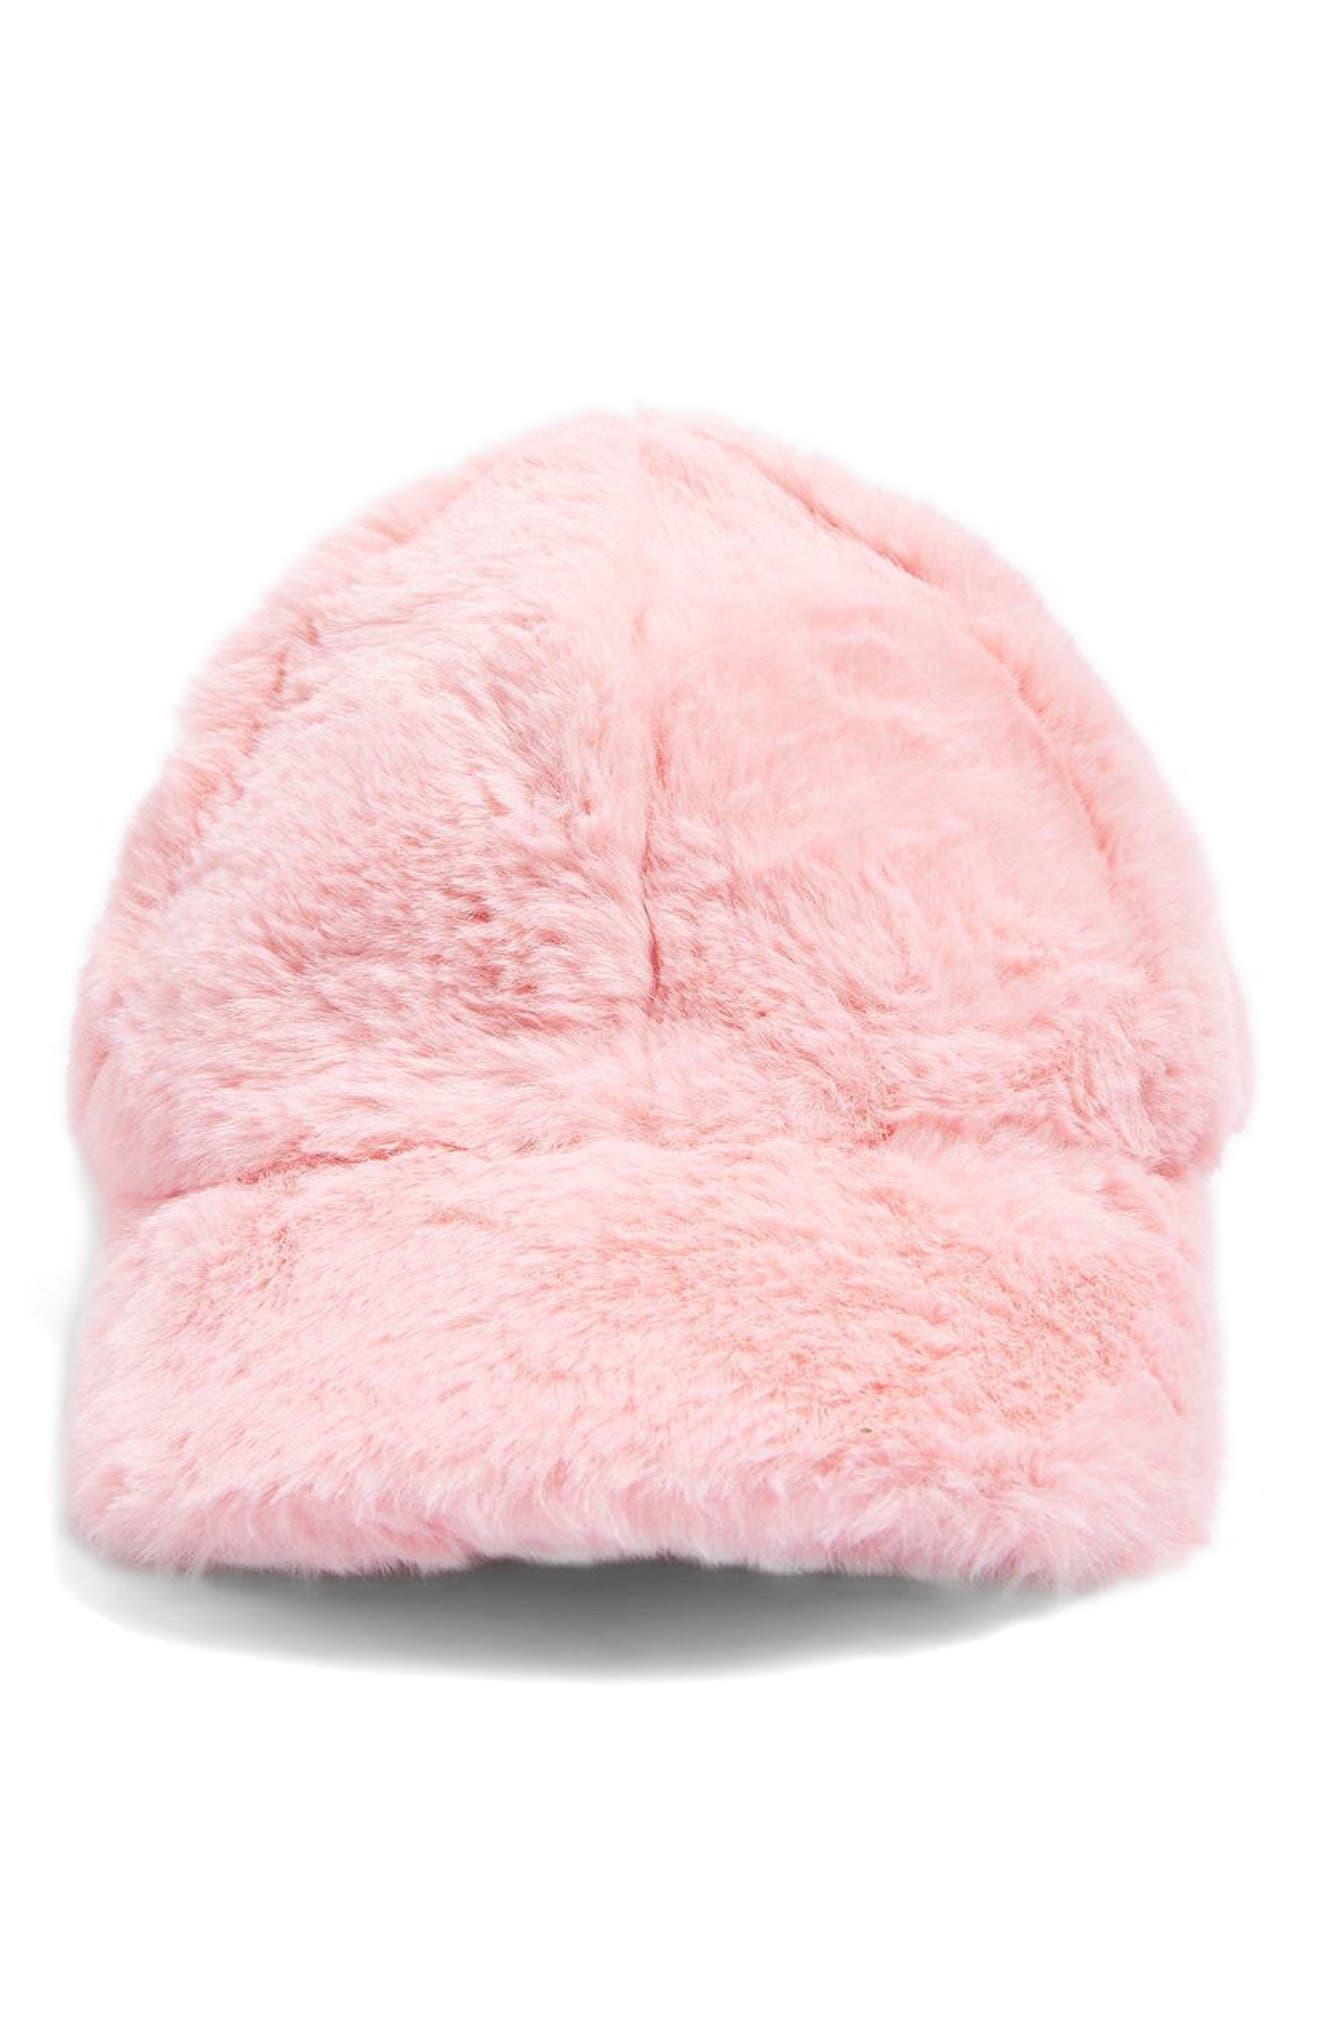 Faux Fur Baseball Cap,                             Alternate thumbnail 3, color,                             Pink